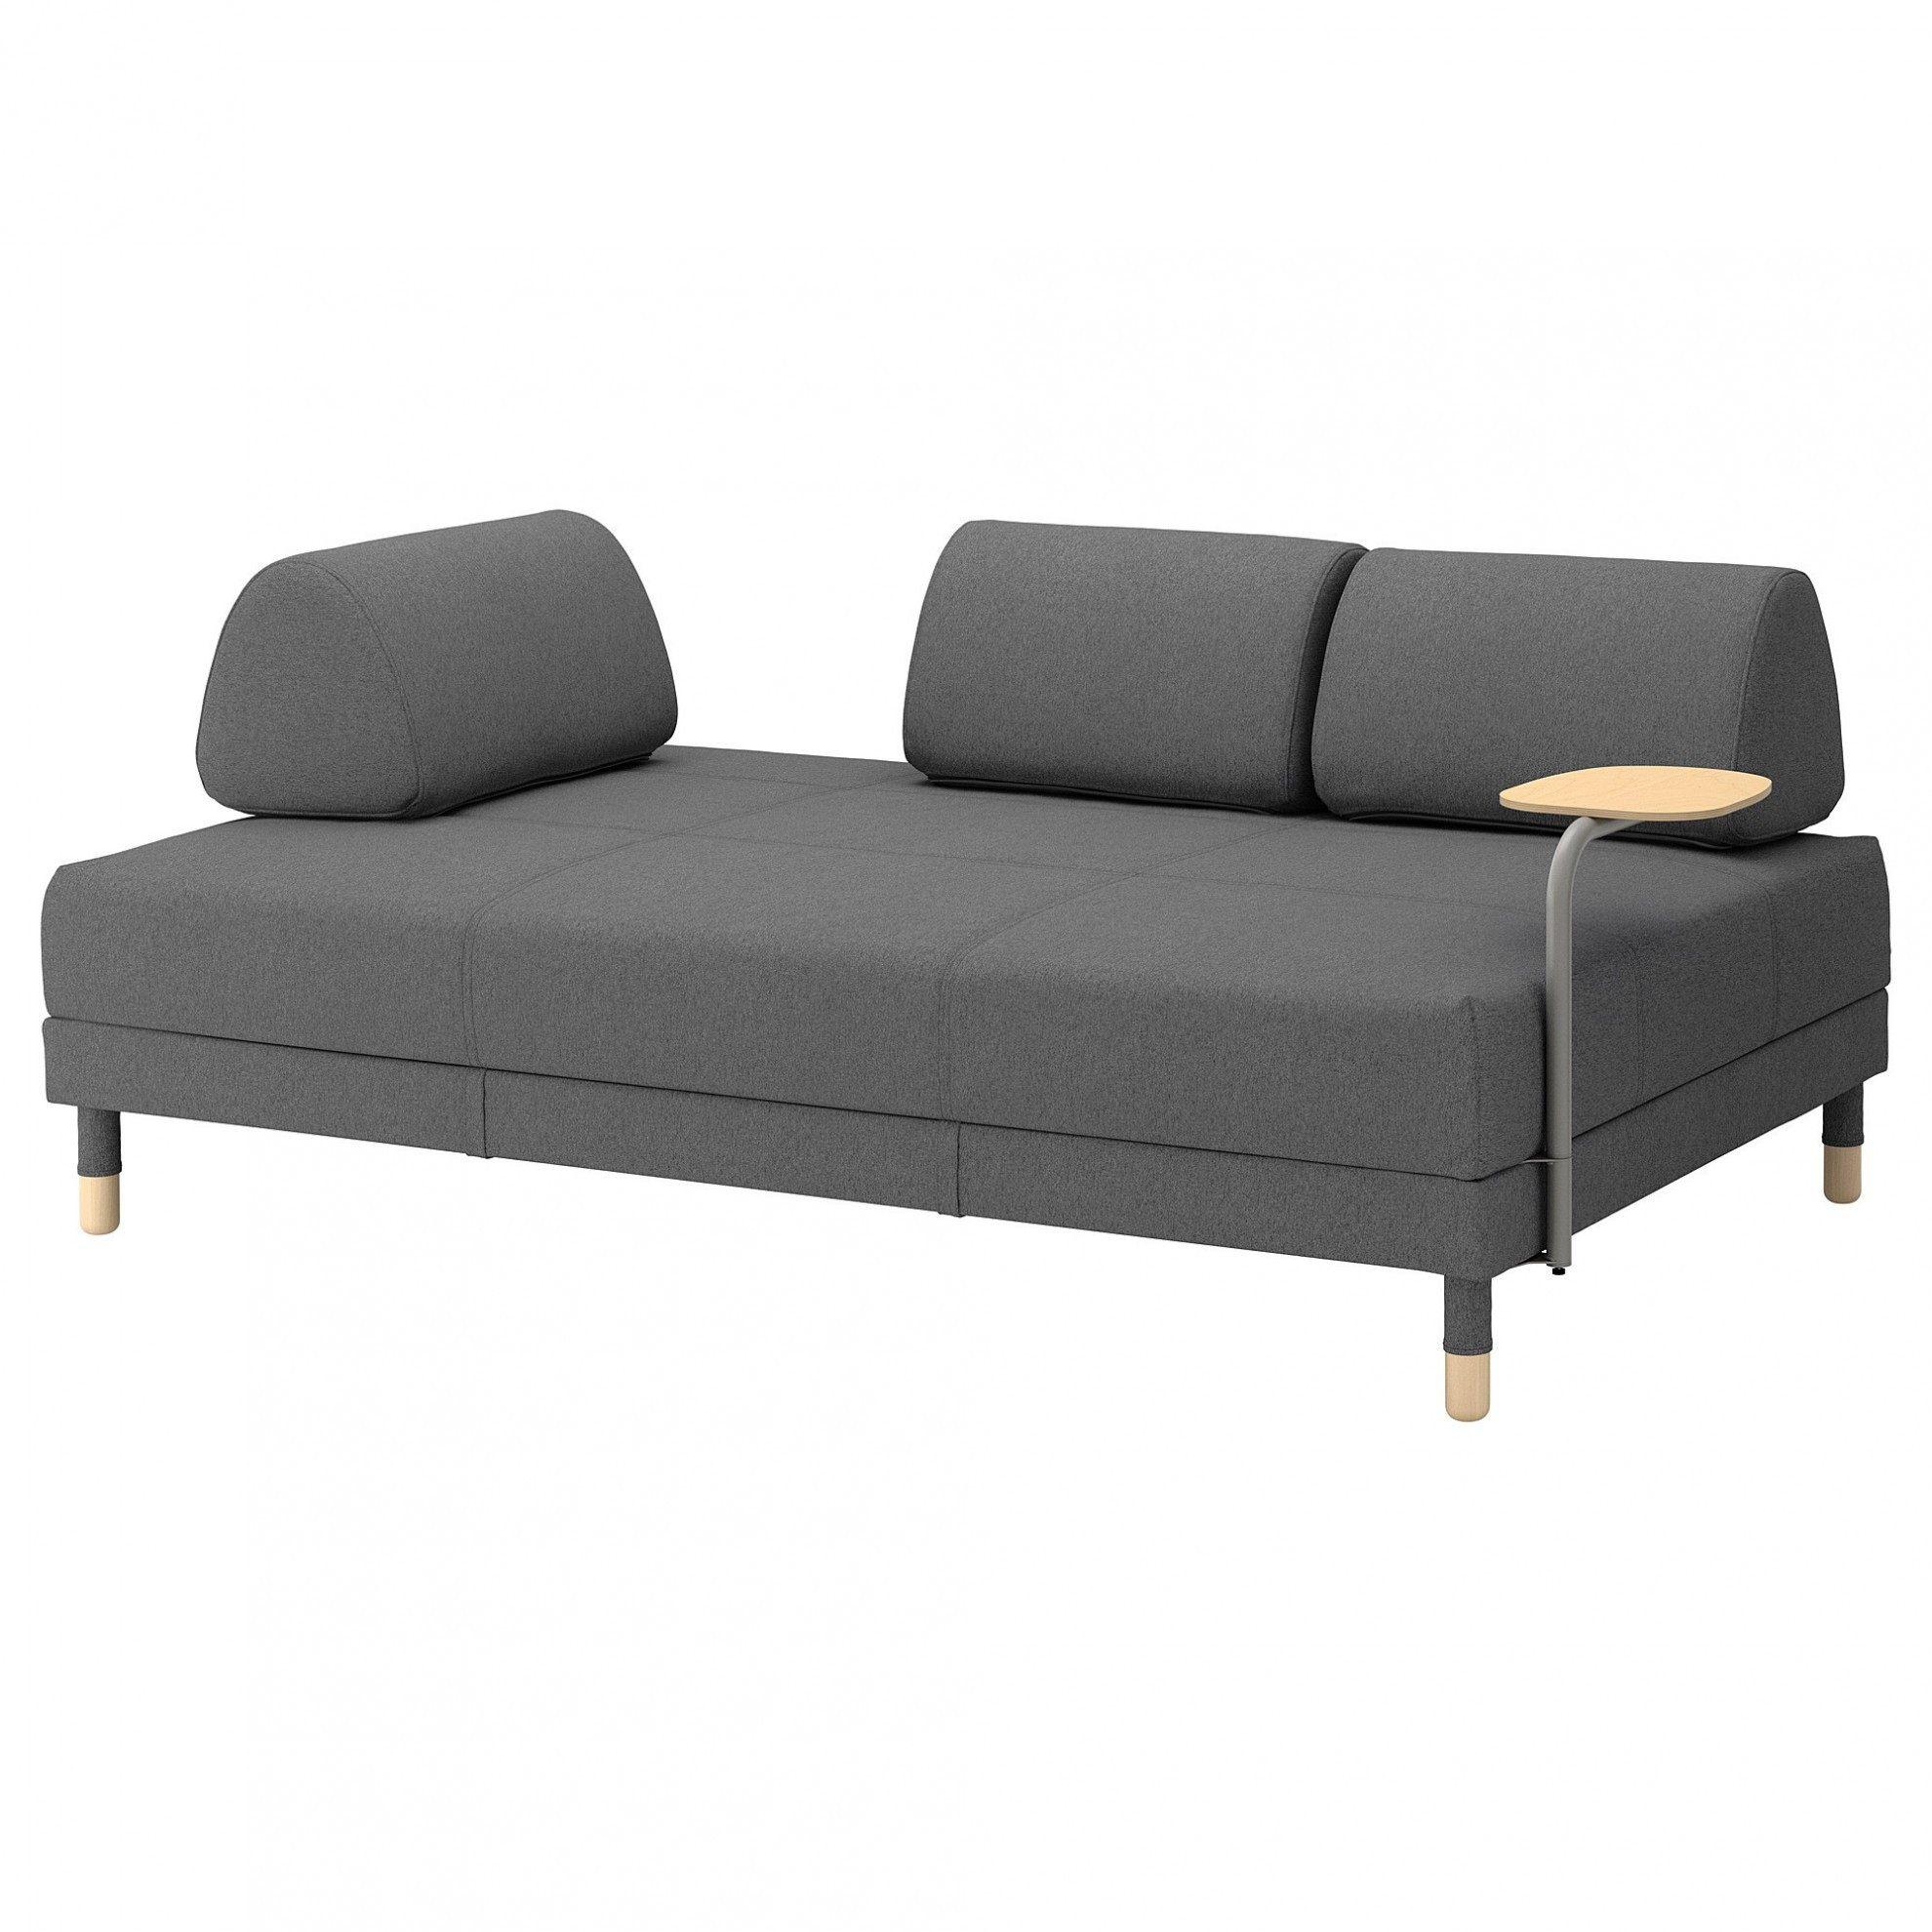 Lit Superposé Avec Rangement Joli Entra Nant Lit Superposé Avec Canapé Sur Lit Biné Armoire Fresh Lit